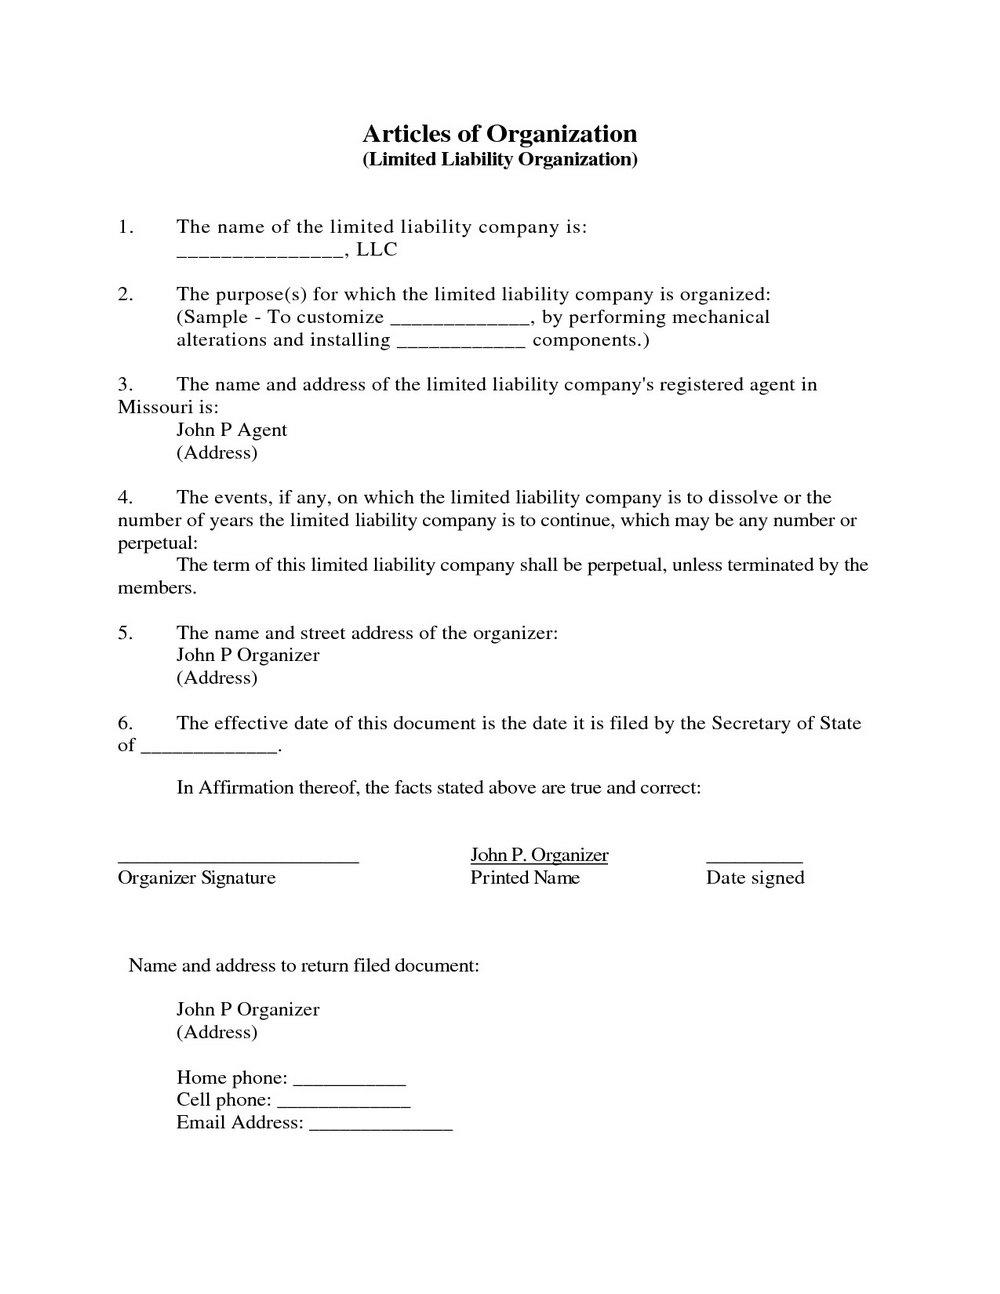 Llc Articles Of Organization Template